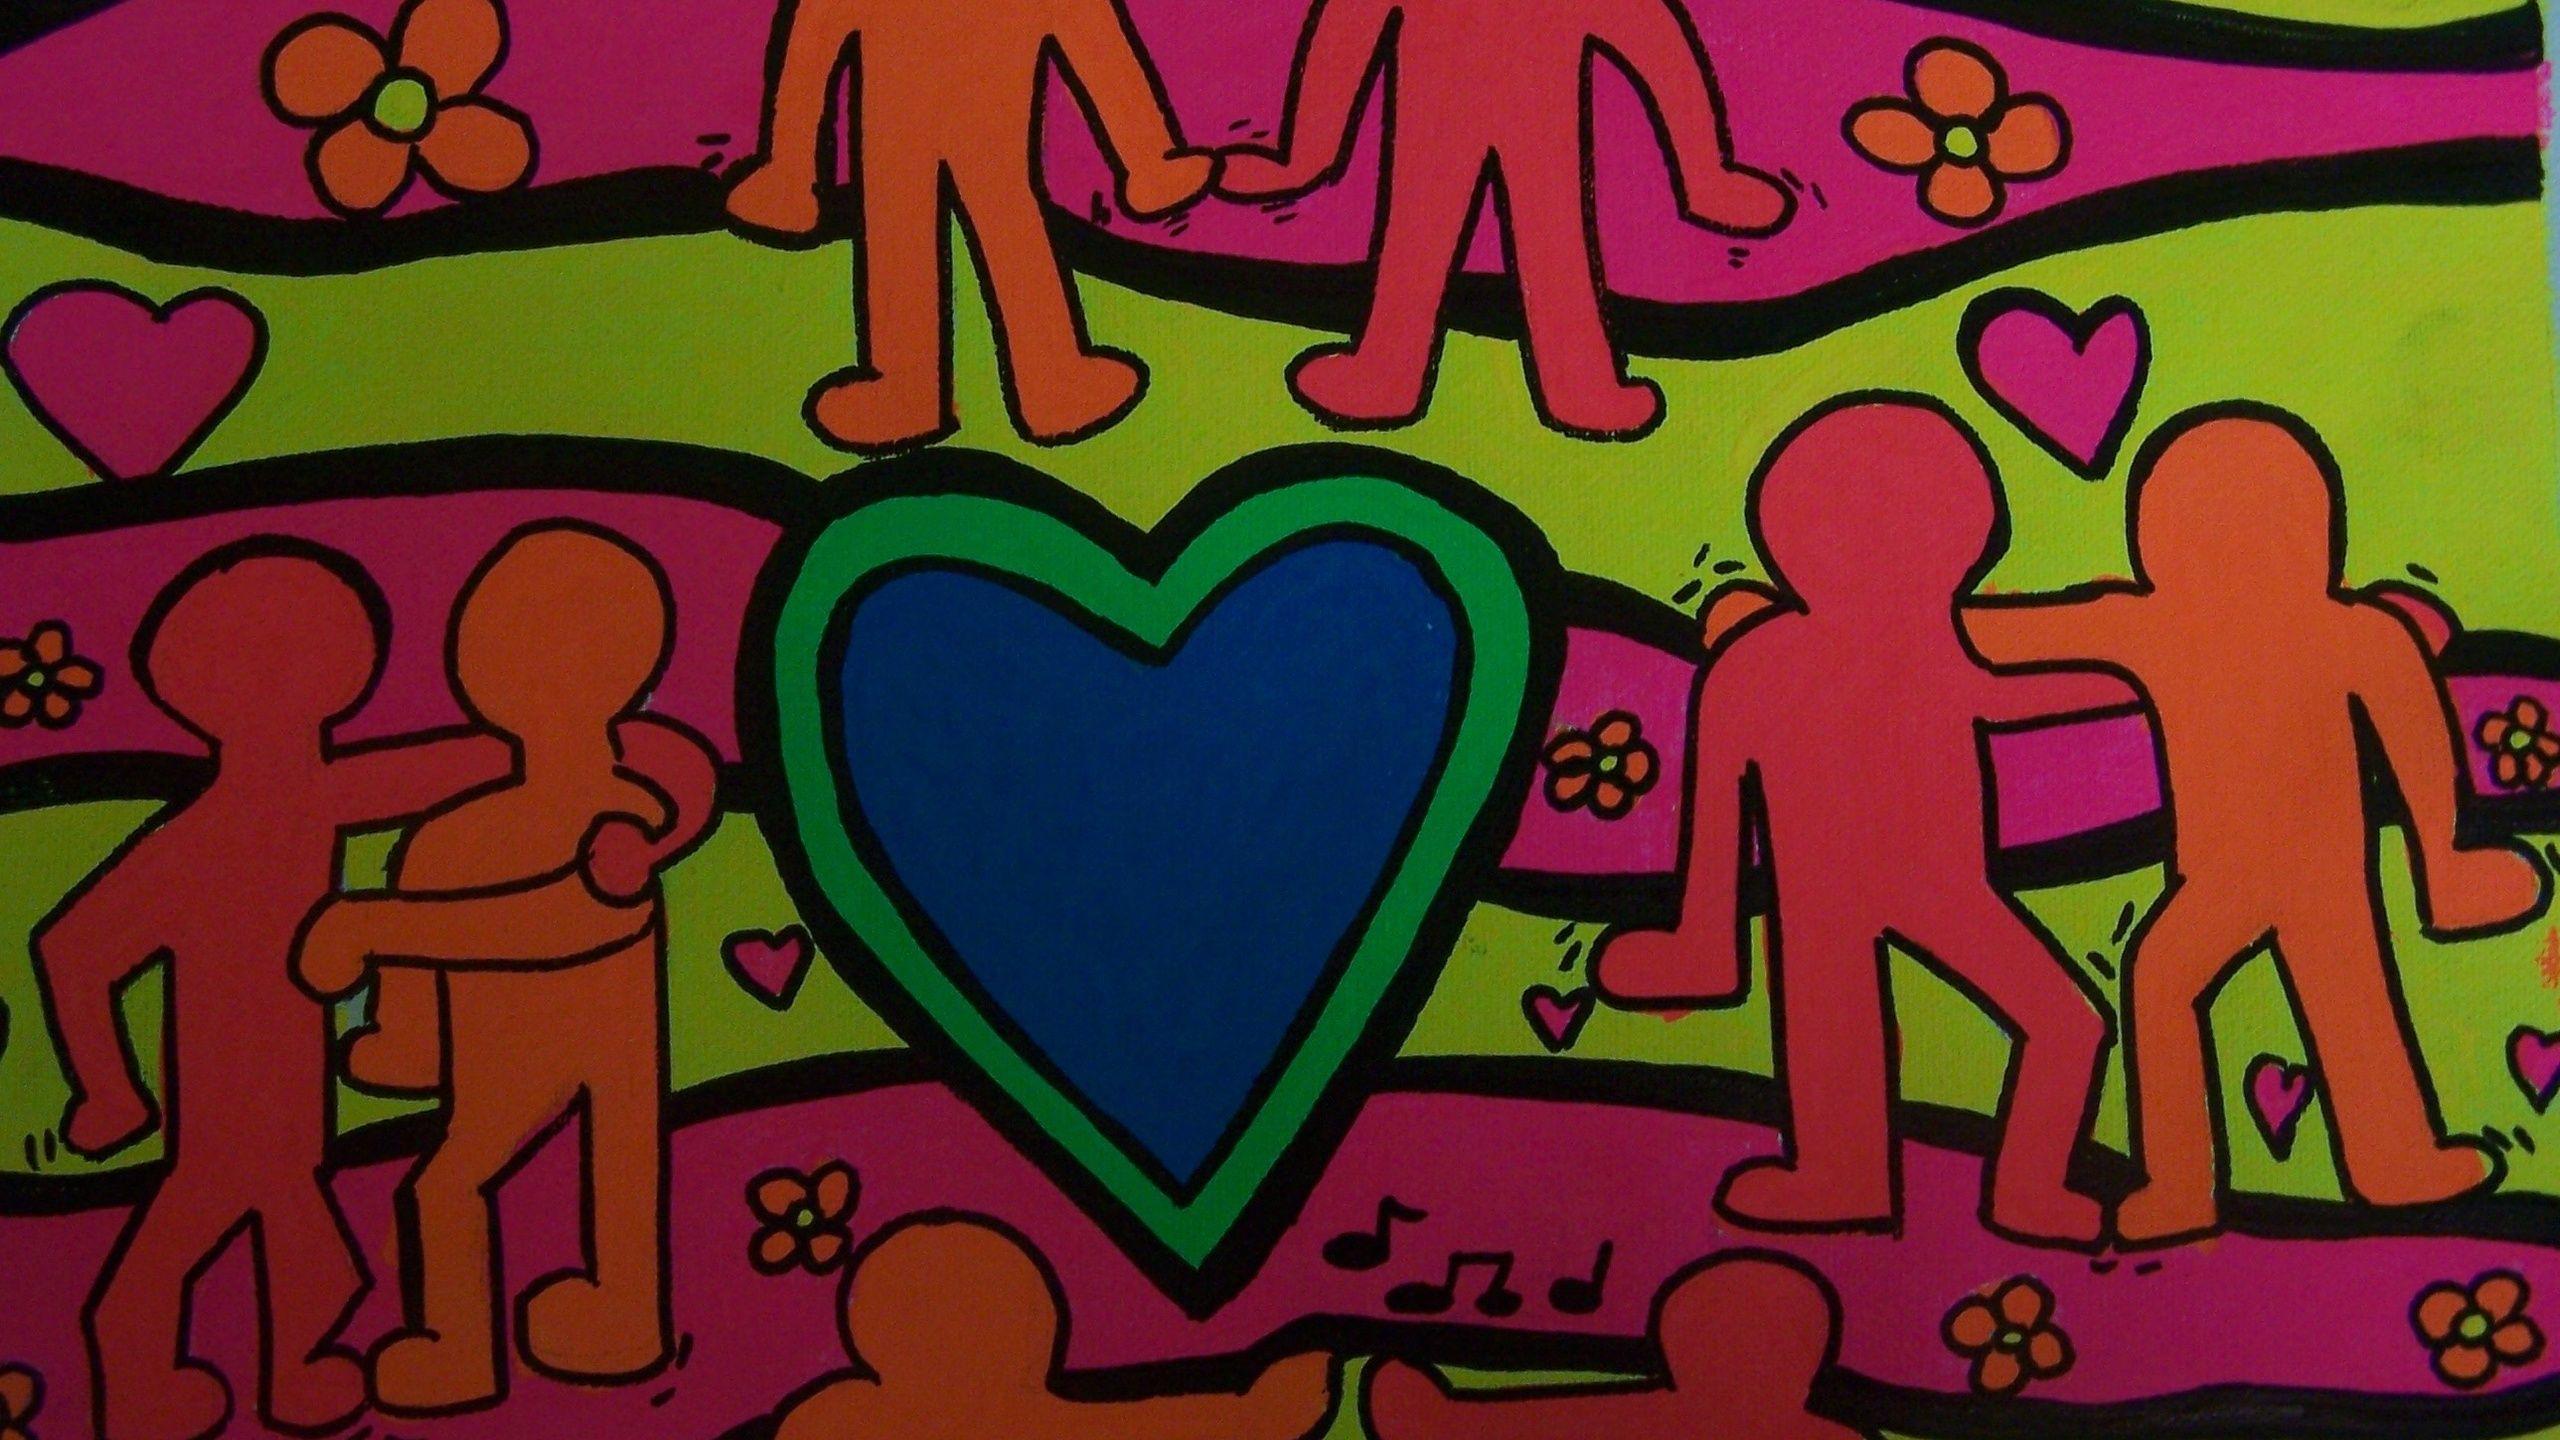 2560x1440 Street Art Keith Haring